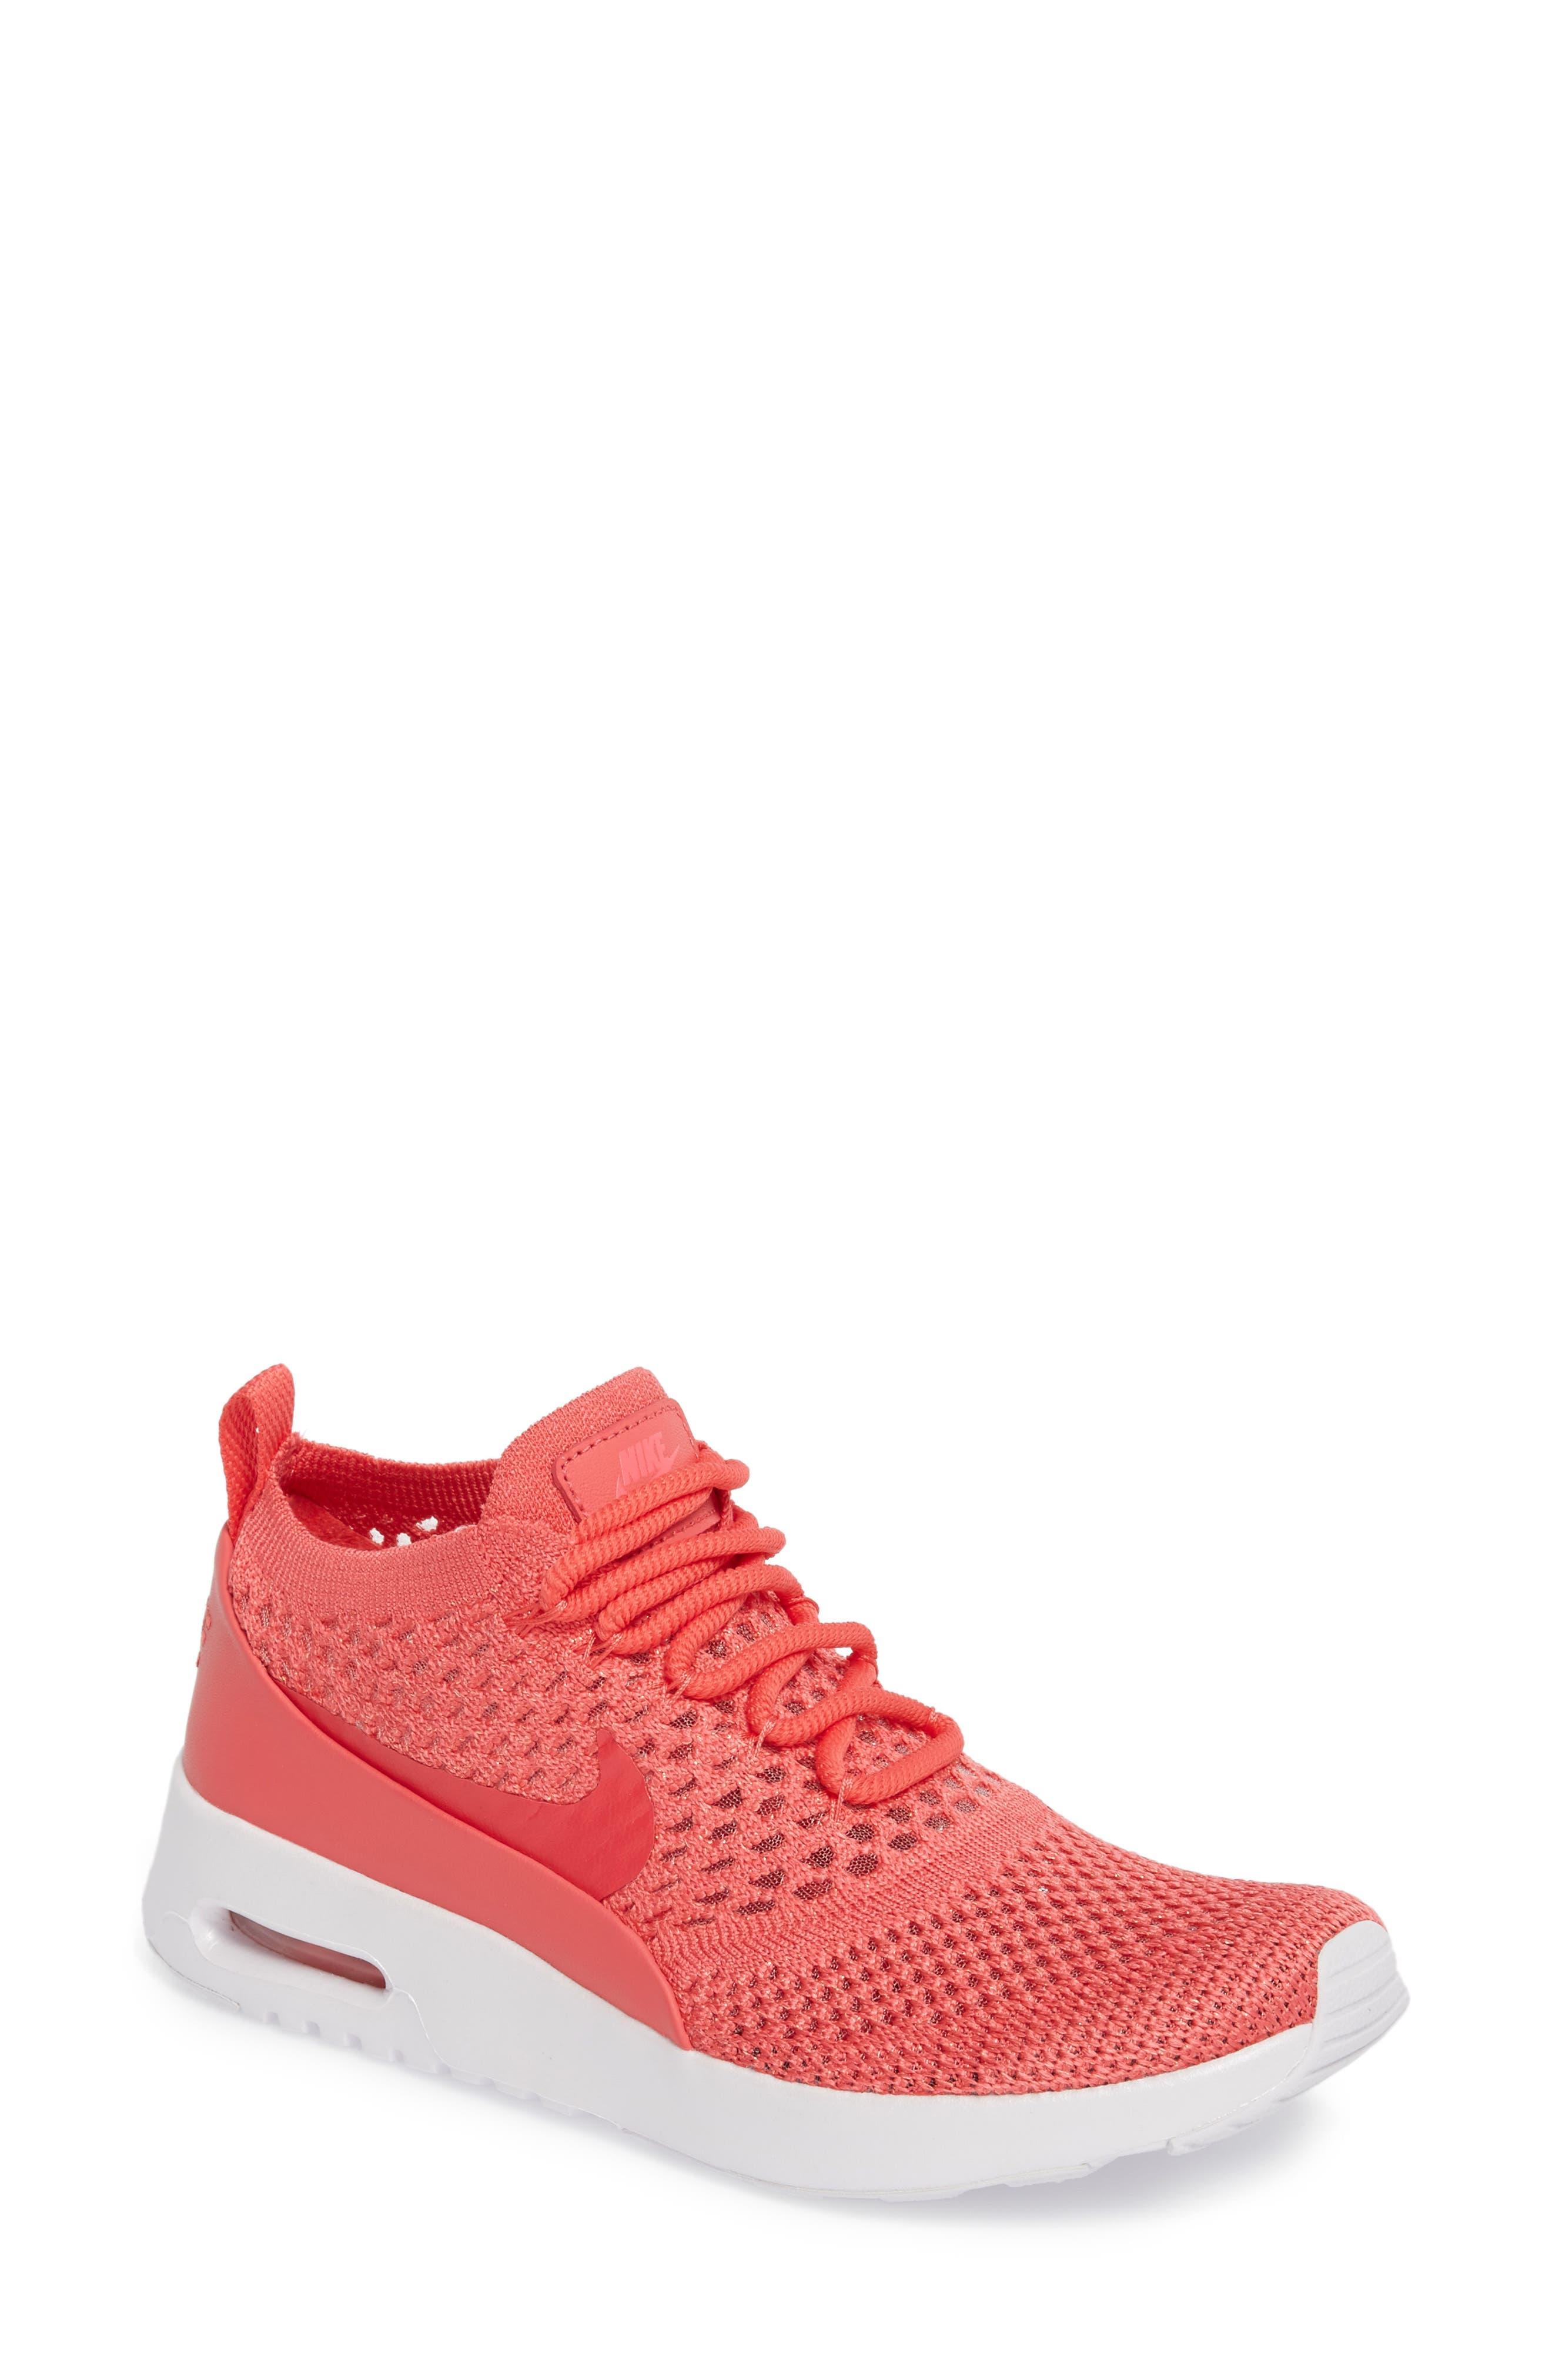 Air Max Thea Ultra Flyknit Sneaker,                             Main thumbnail 2, color,